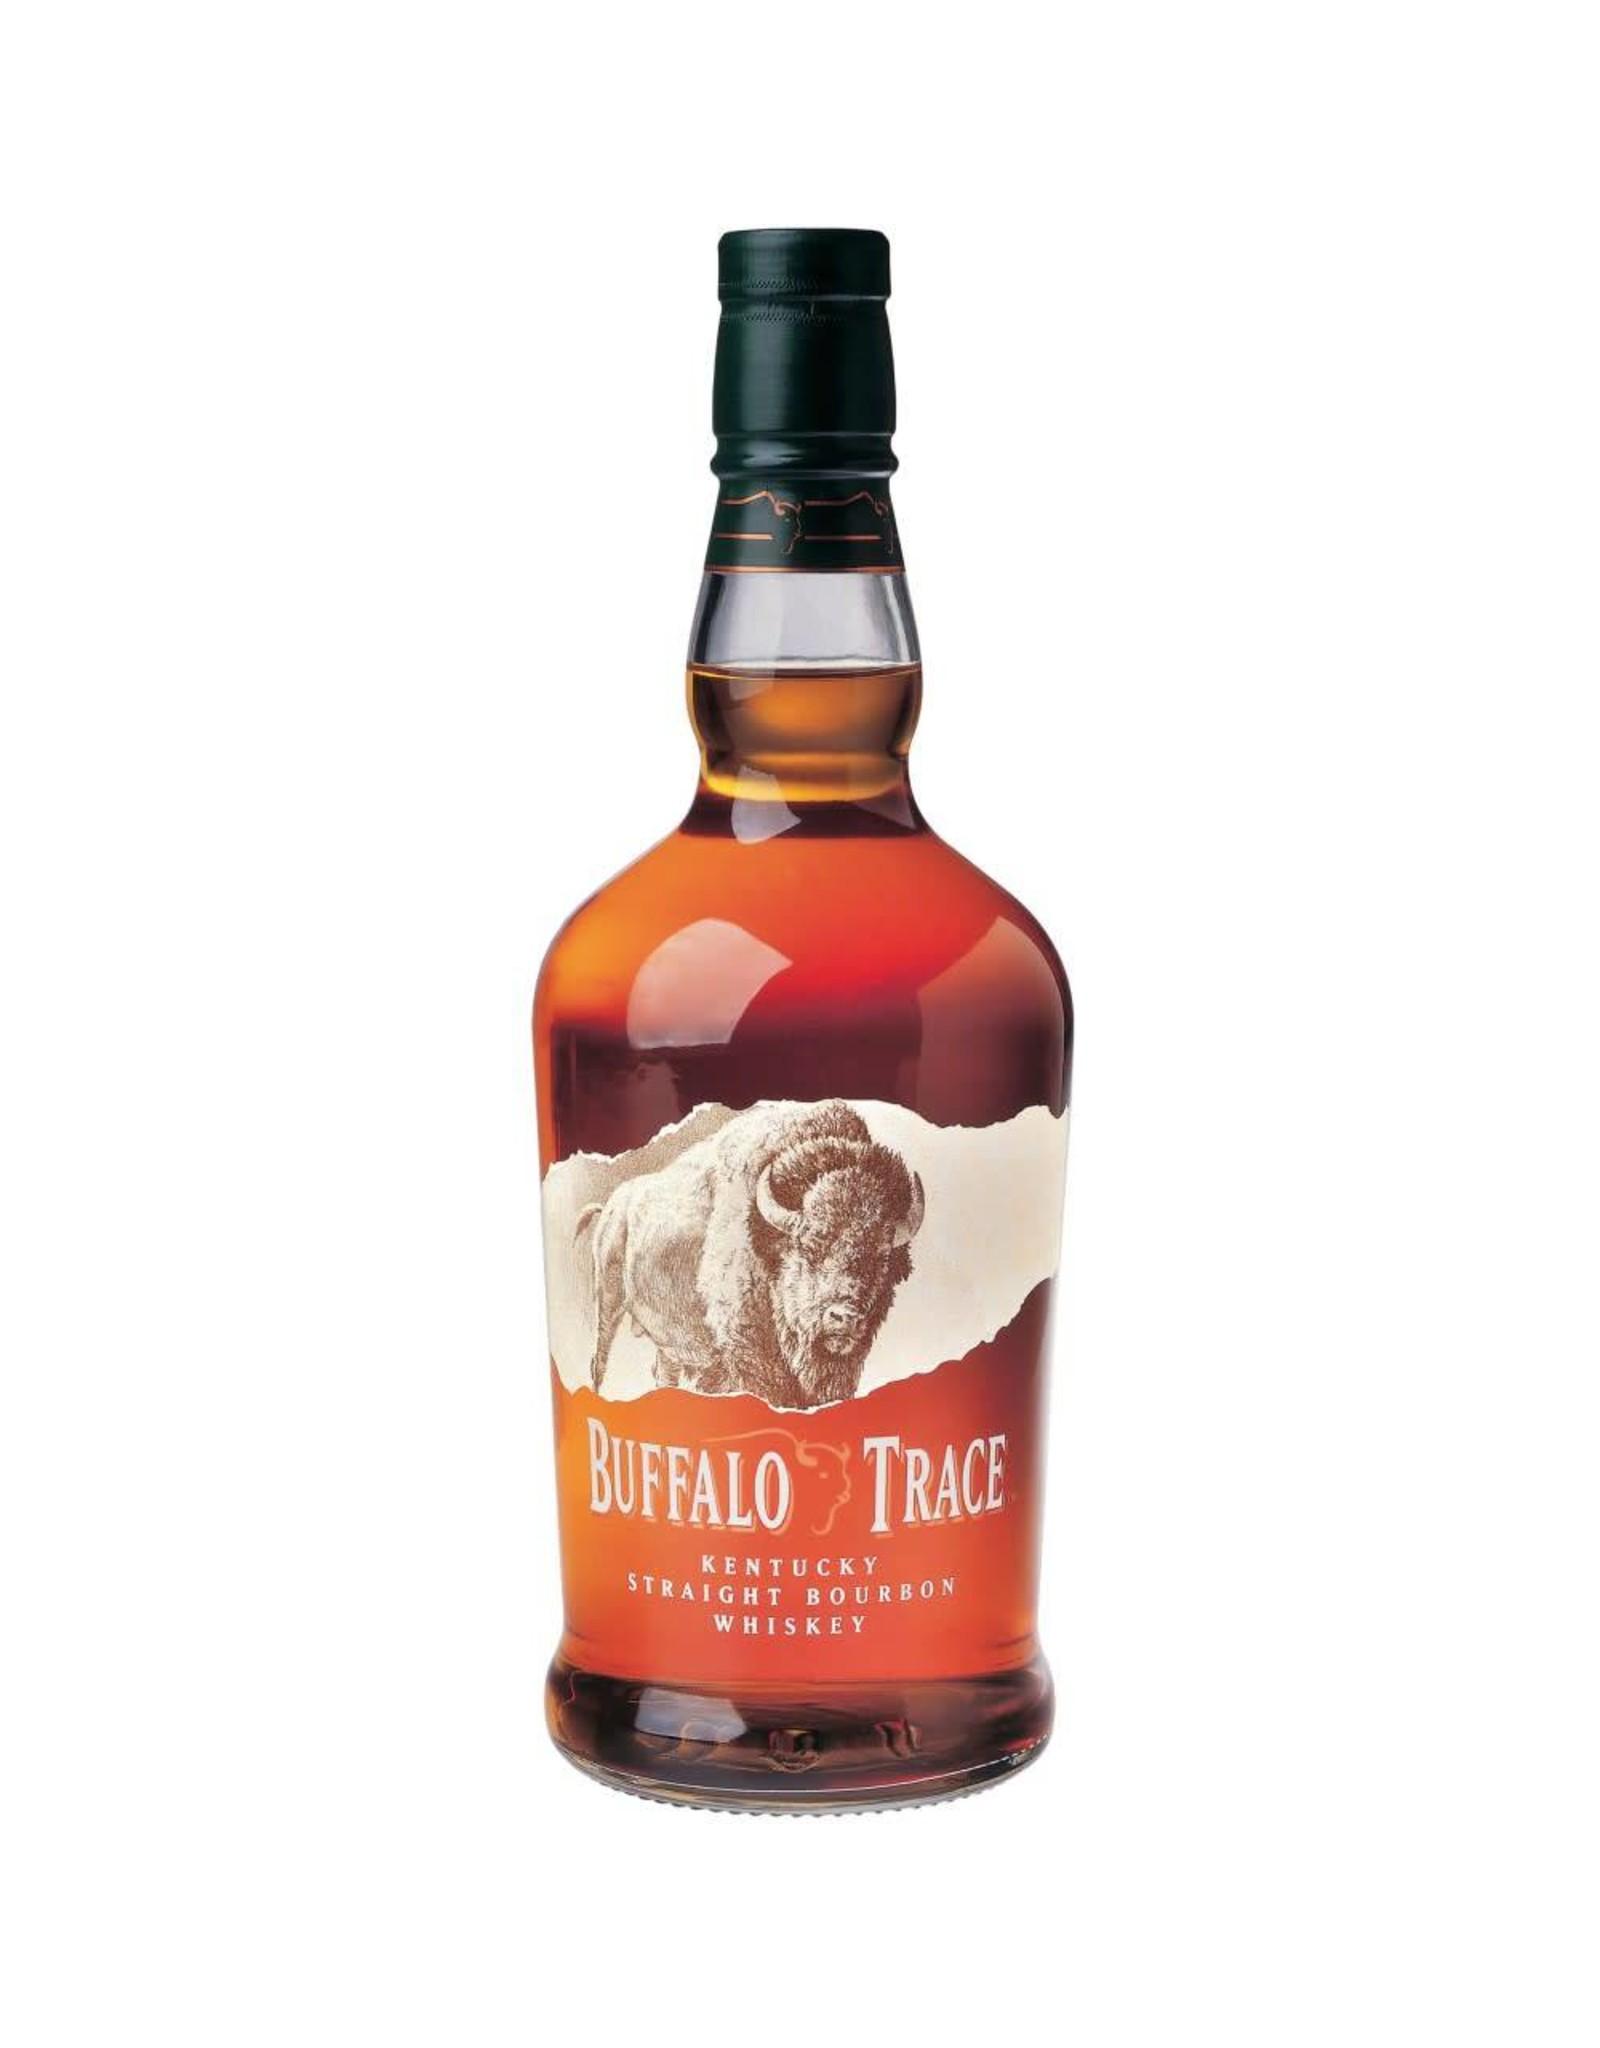 Buffalo Trace Kentucky Straight Bourbon 80 Proof, Kentucky (1750ml)